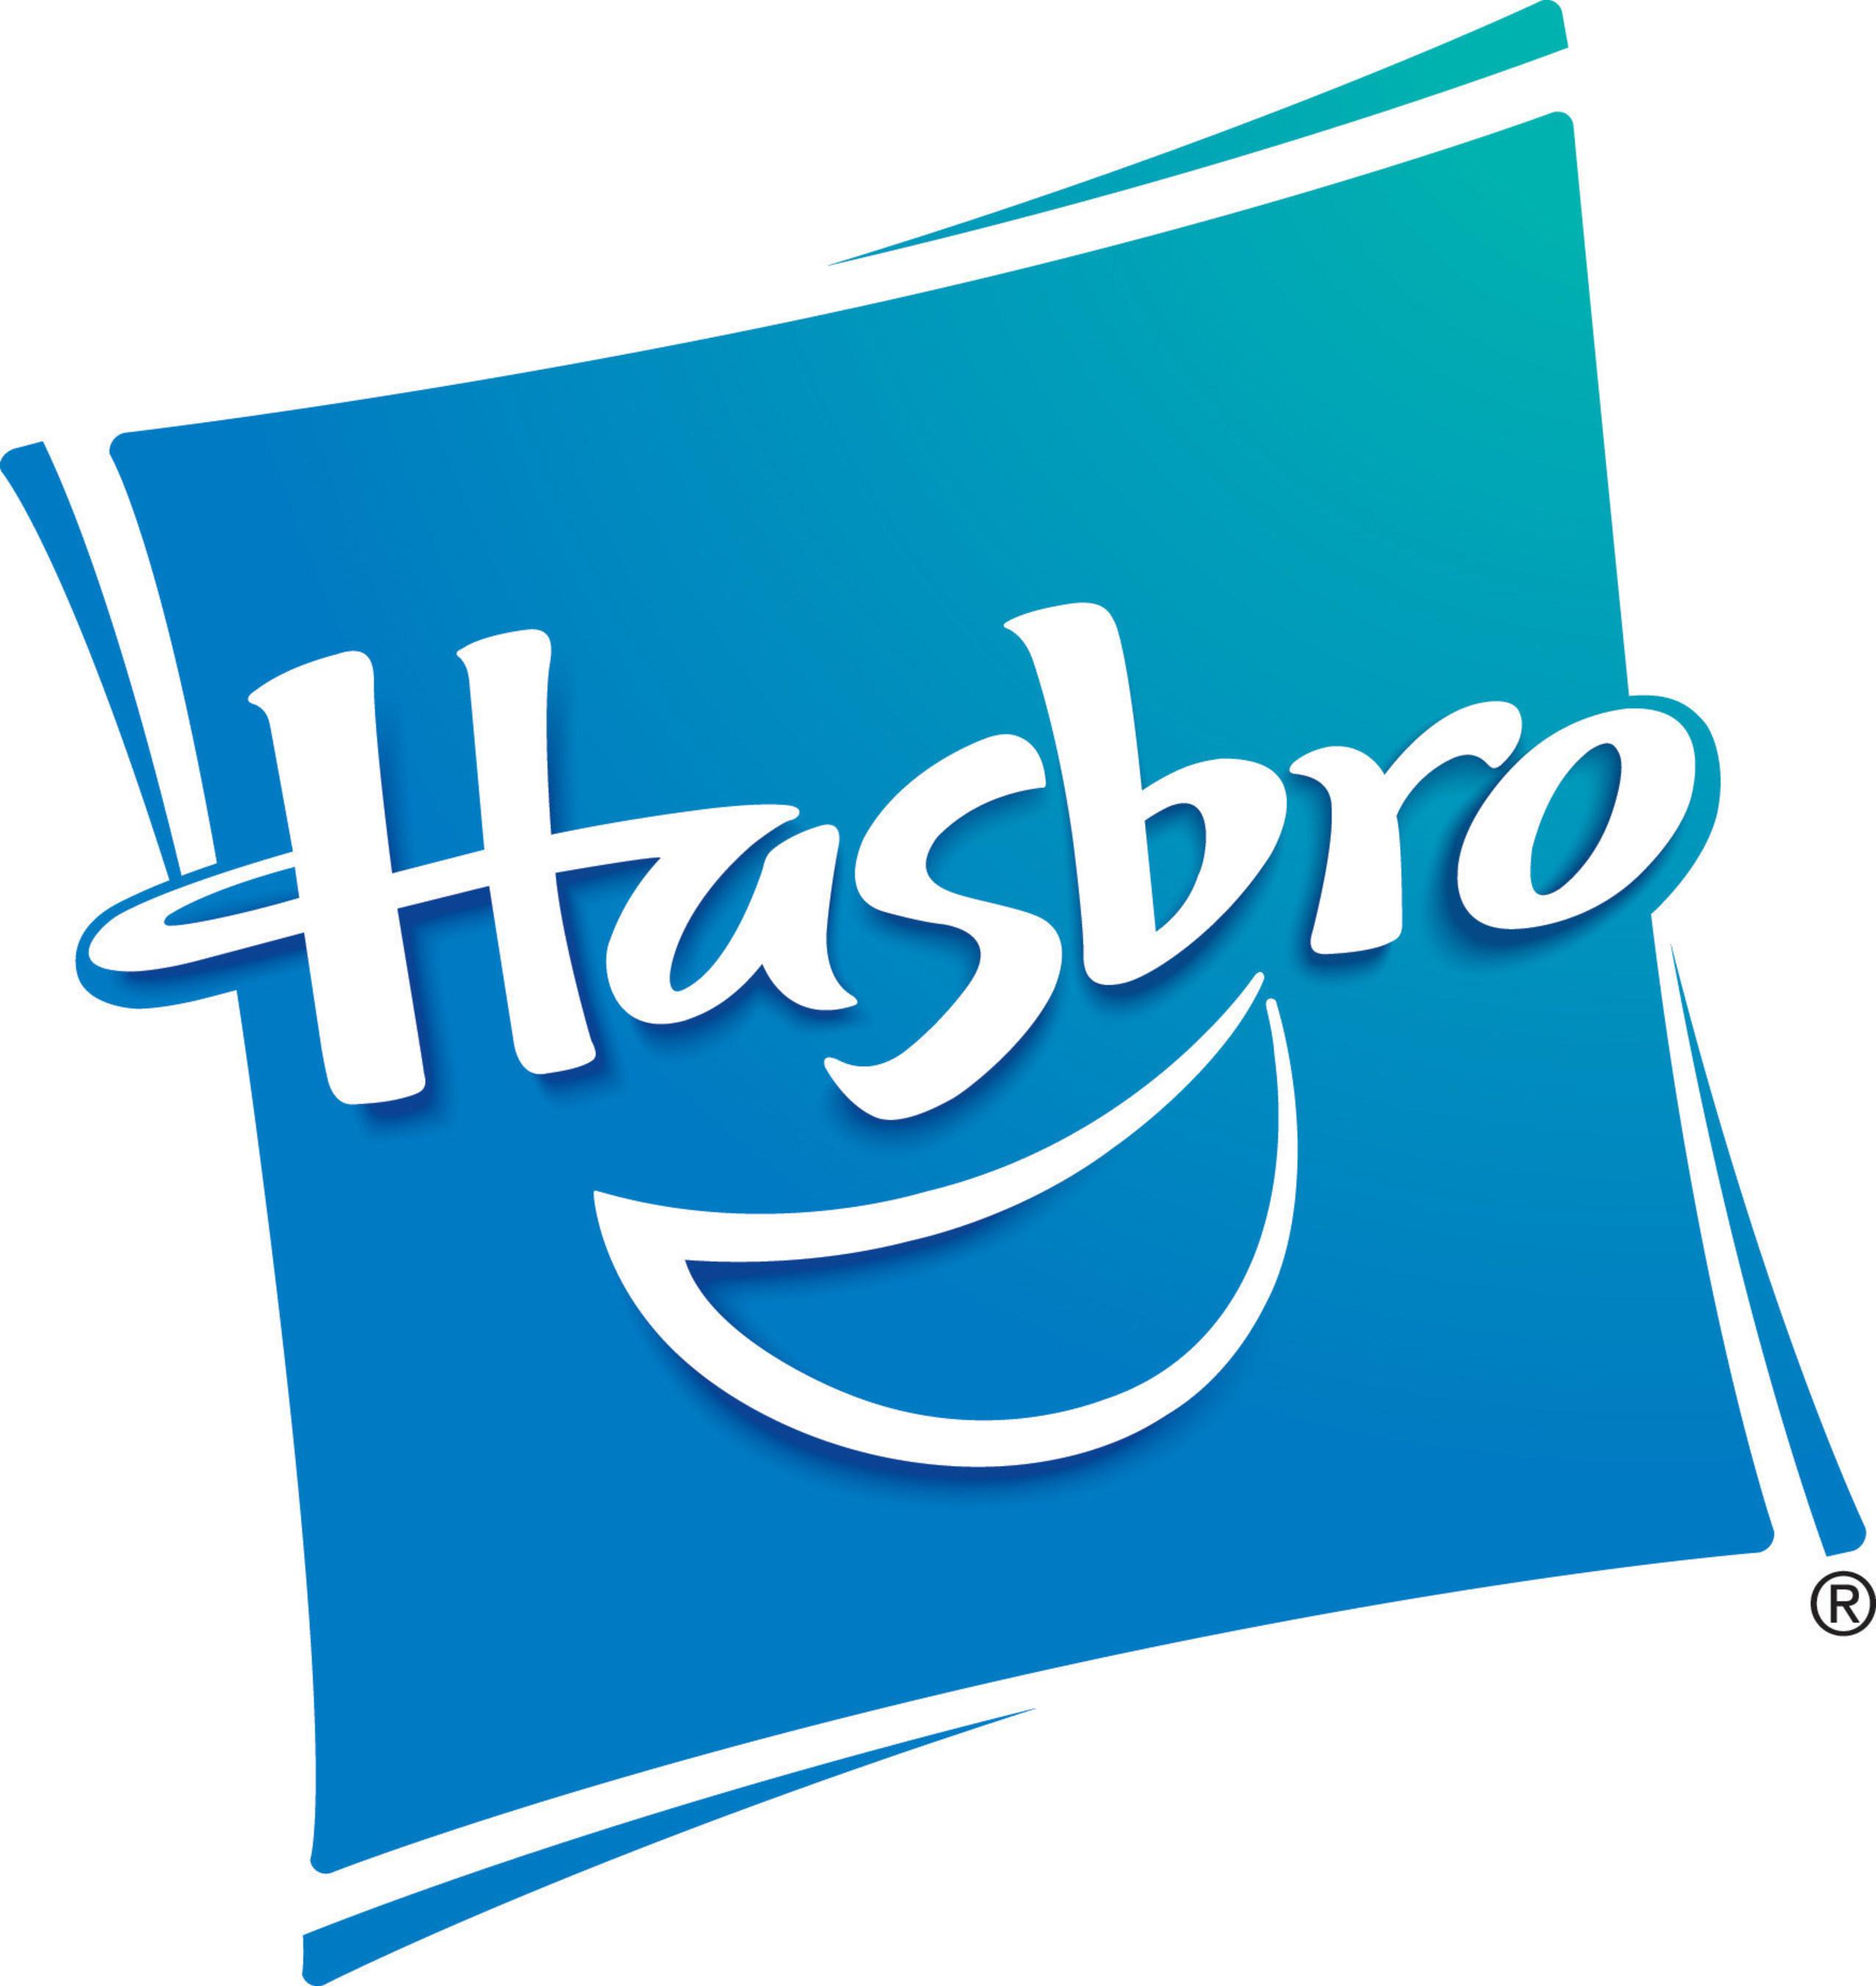 Hasbro, Inc.